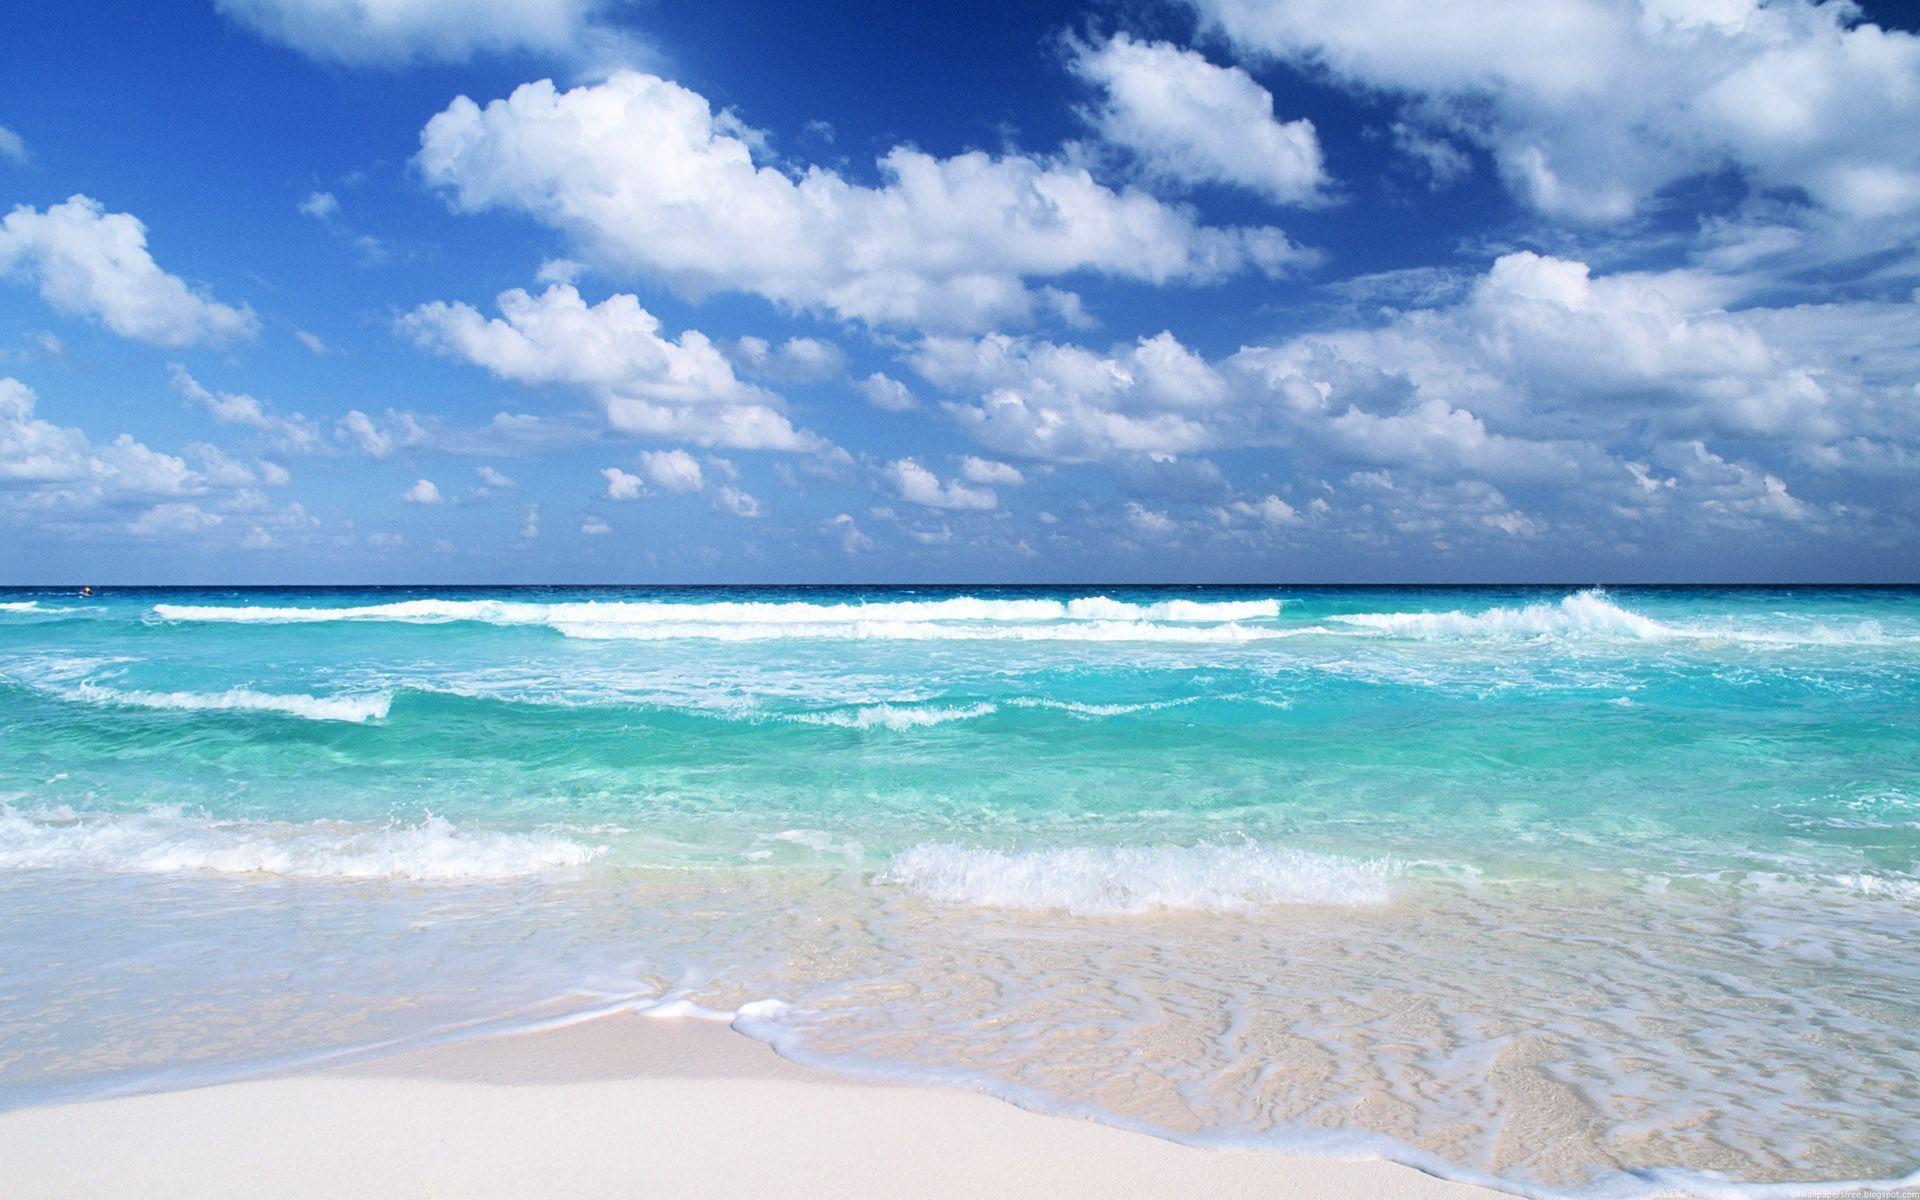 Beach Background Wallpaper